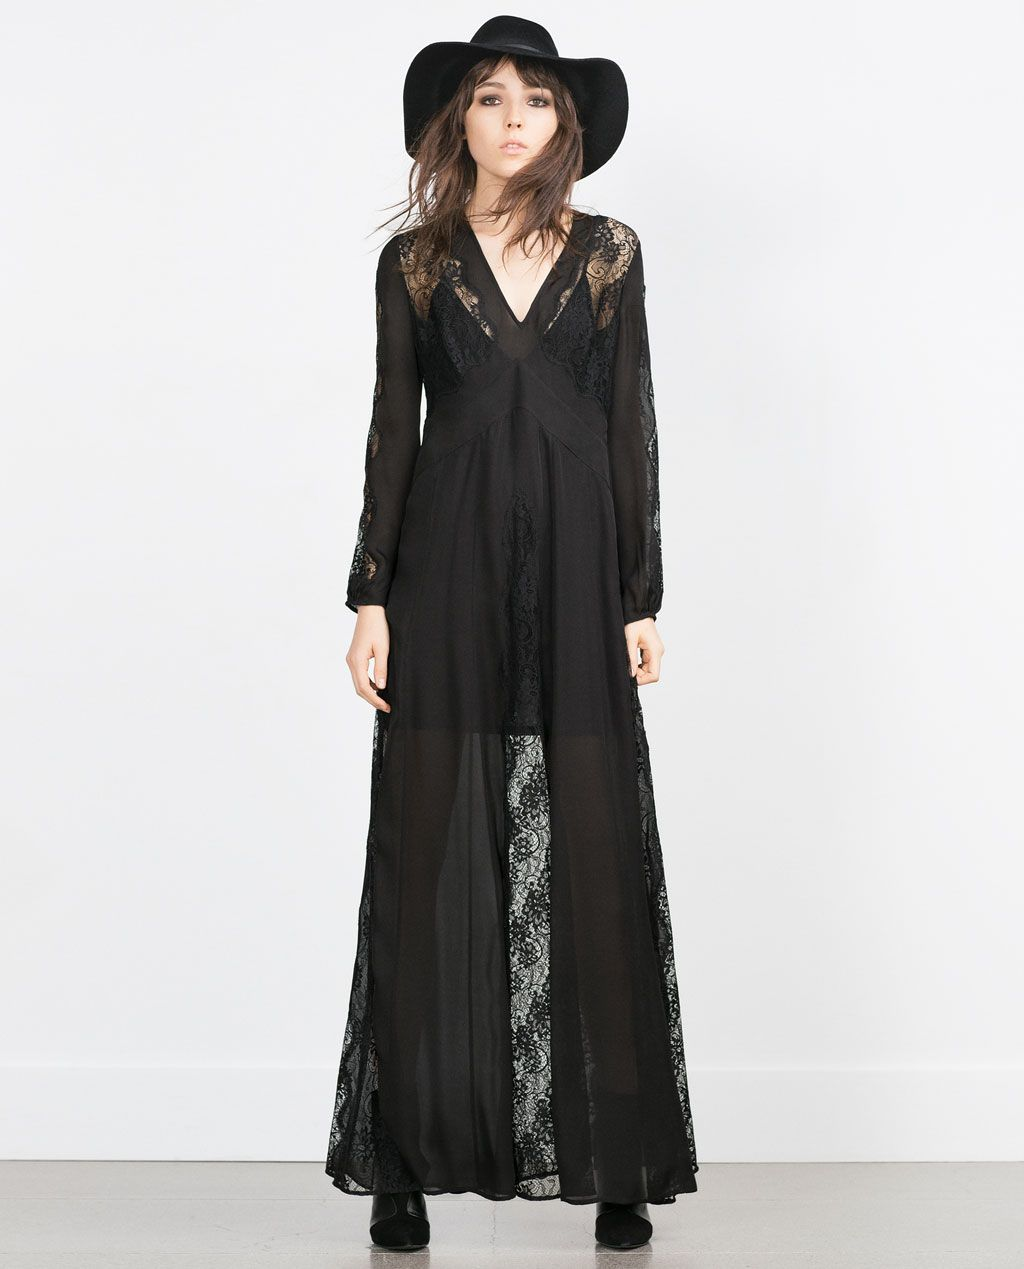 Long Silk Studio Dress With Lace View All Dresses Woman Lace Dress Dress Blog Dresses